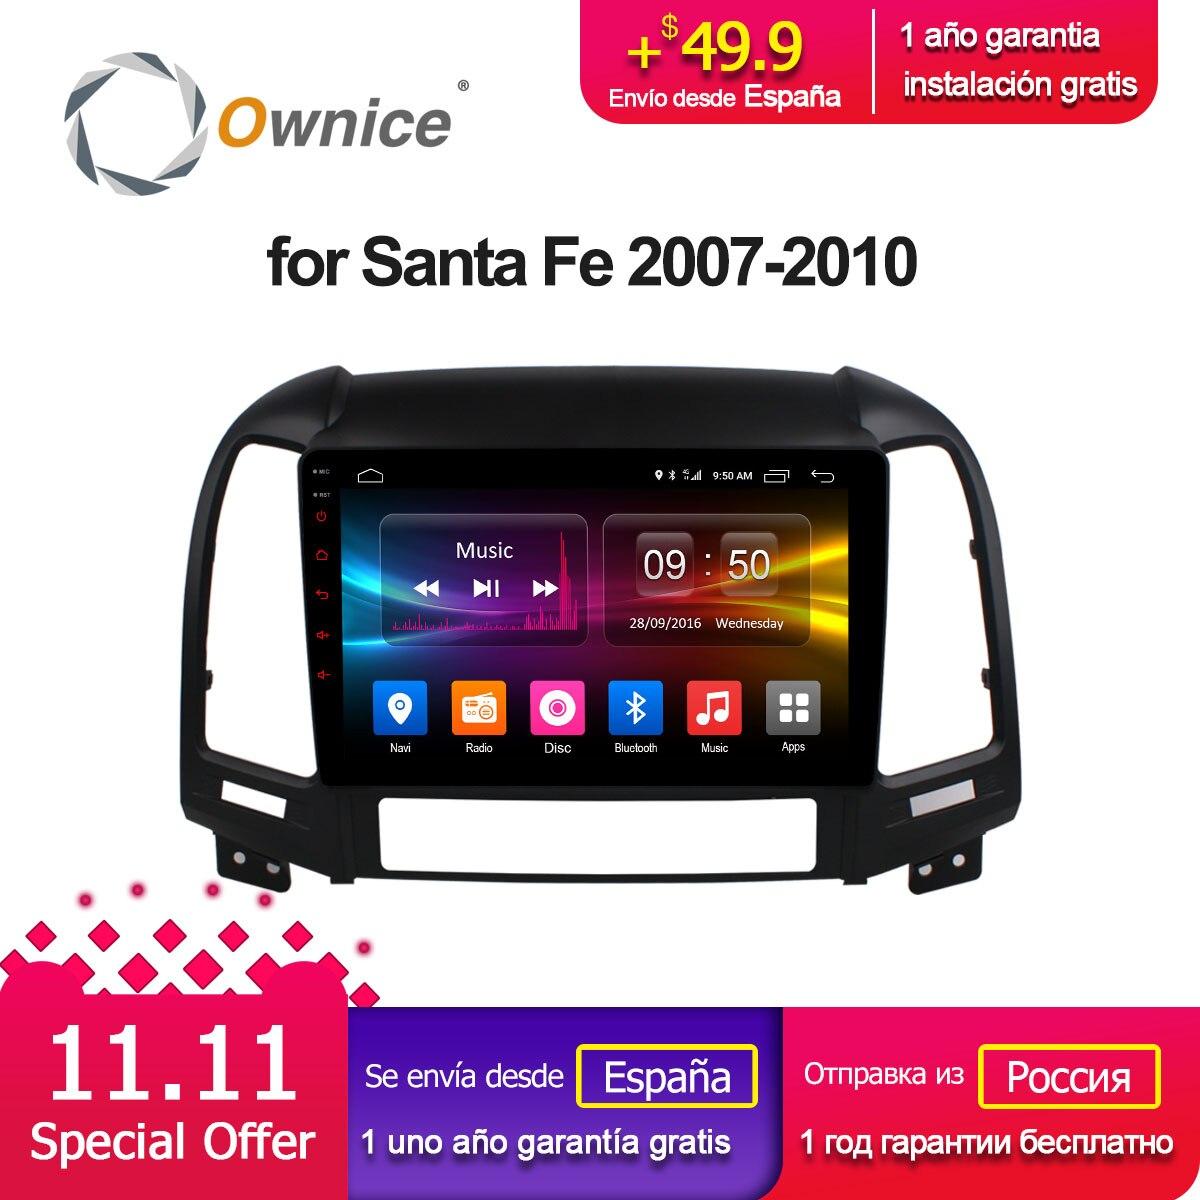 Ownice C500 + G10 Octa Core Android 8.1 Auto DVD für Hyundai Santa Fe 2007-2010 Radio Navigation gps-player 32g + 2g 4g SIM LTE